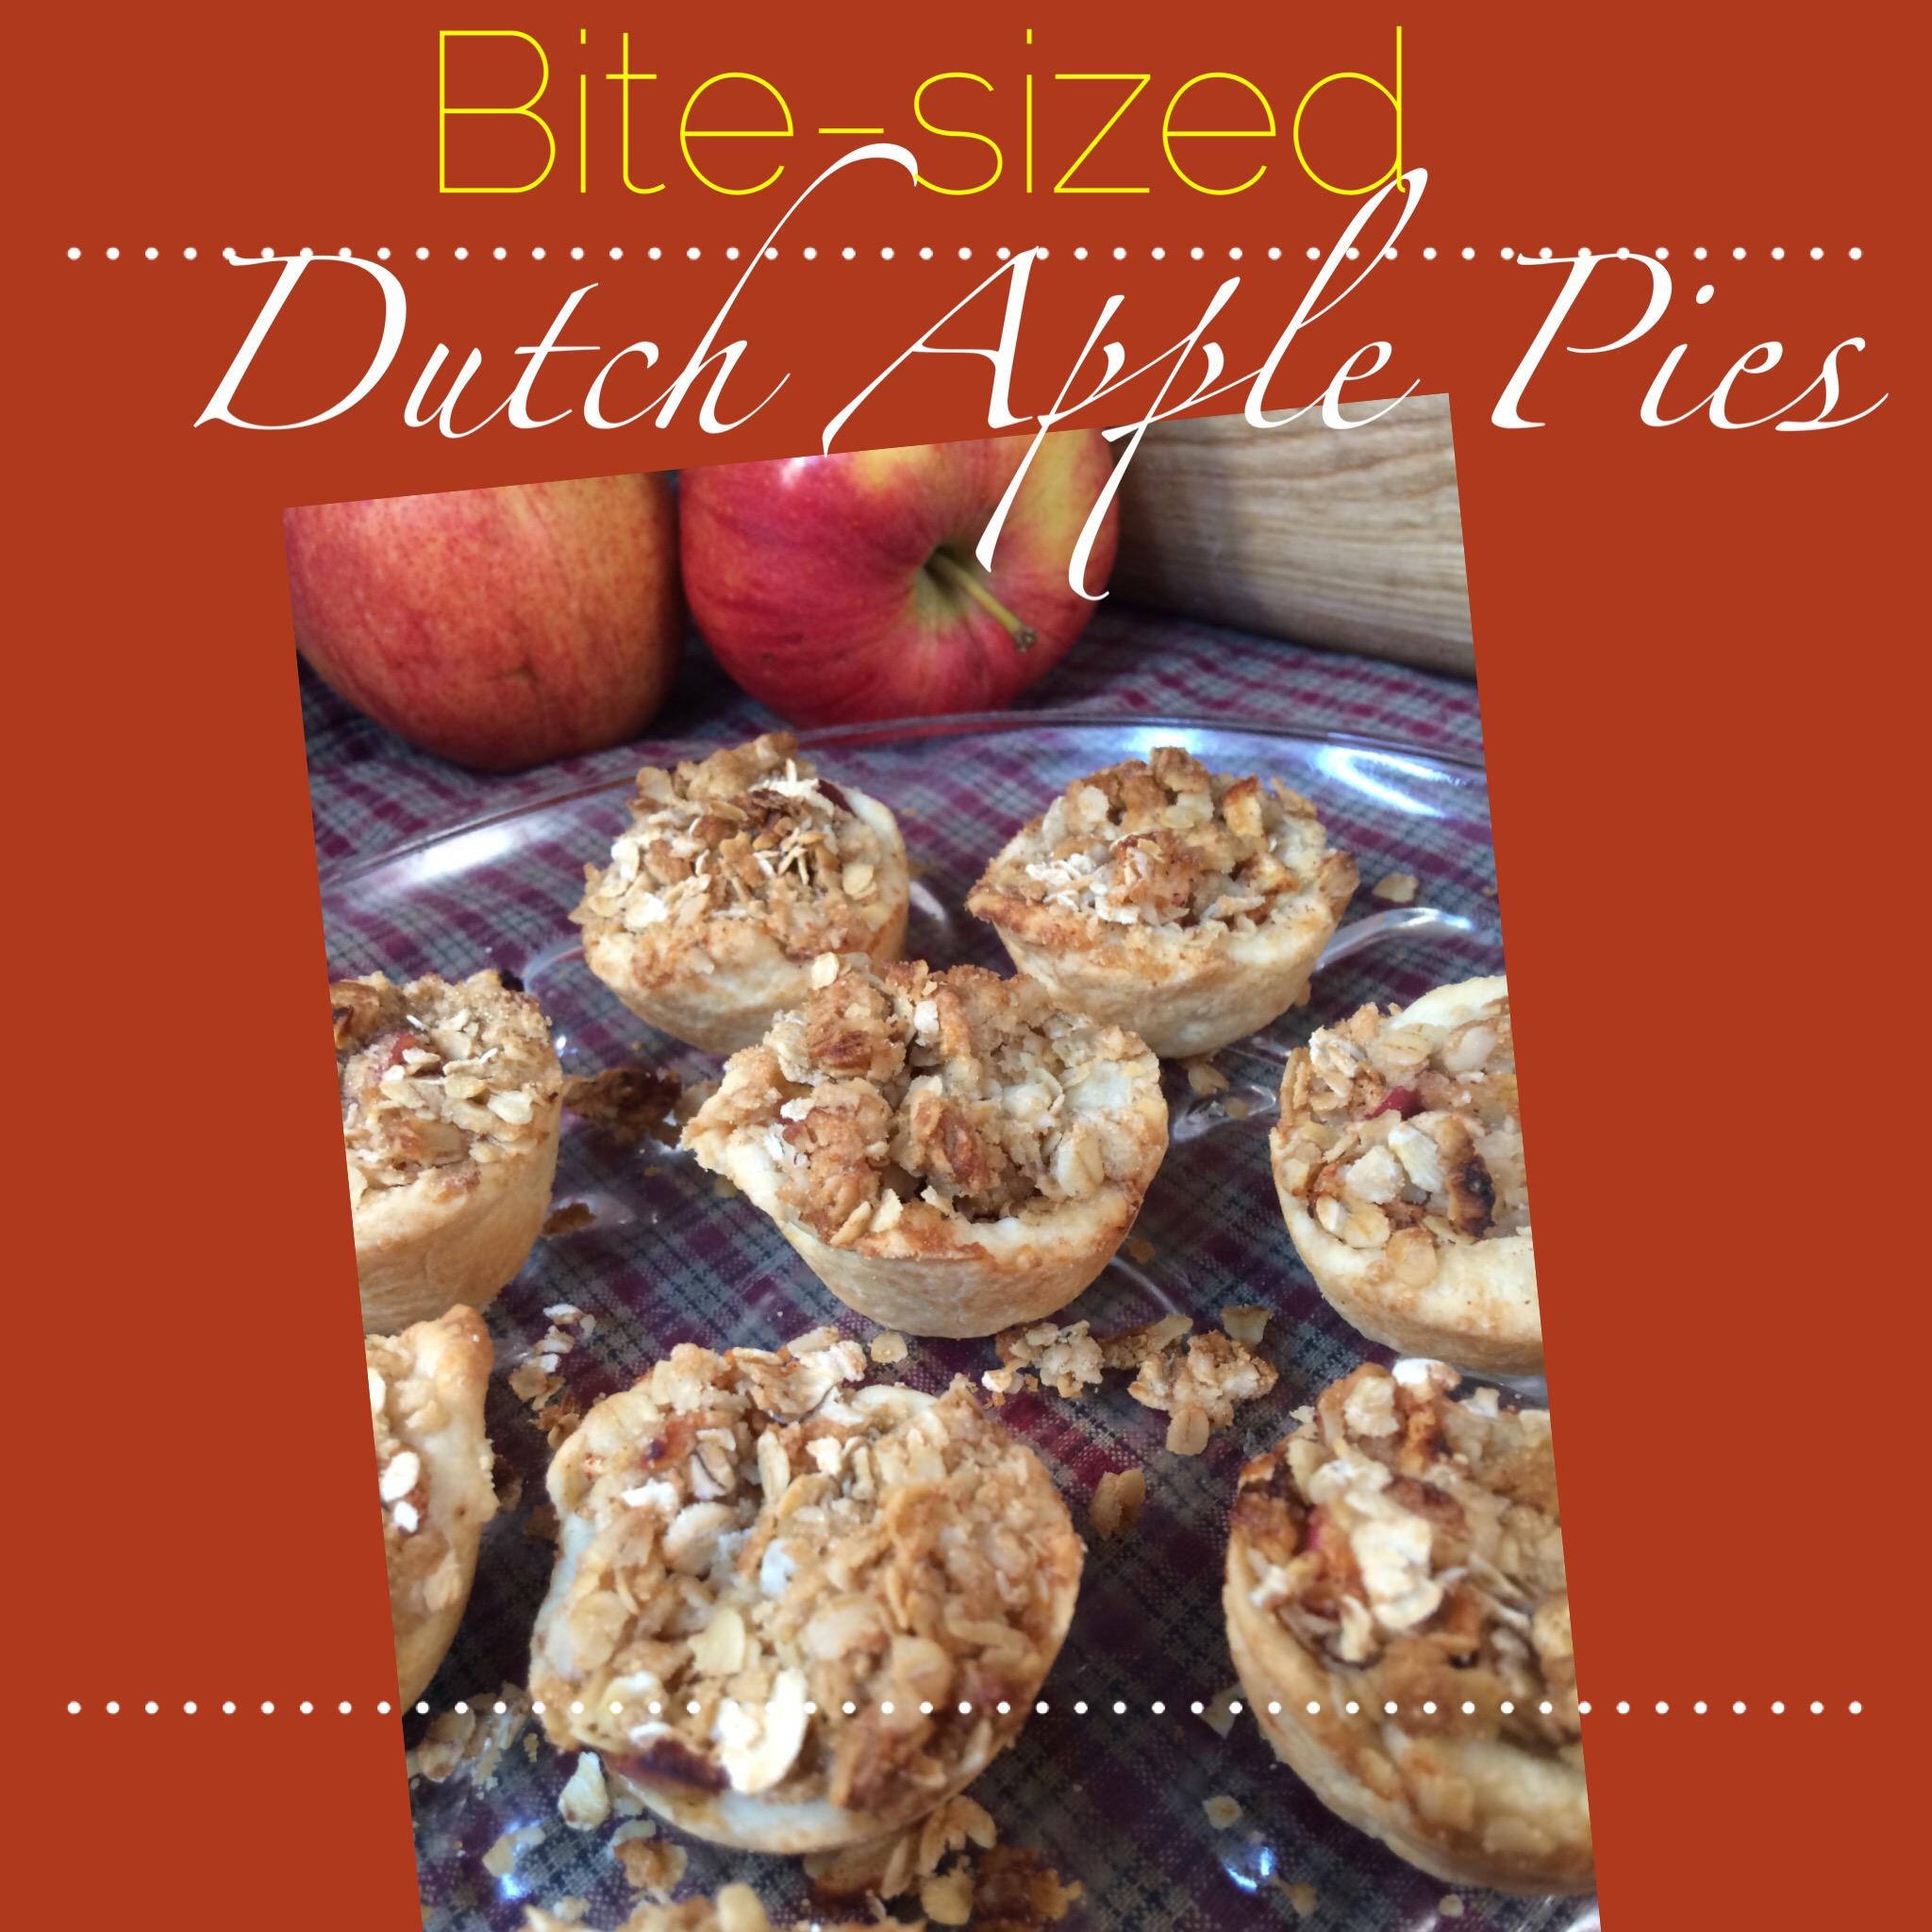 Life Made Bite-Sized: Bite-Sized Dutch Apple Pie Recipe